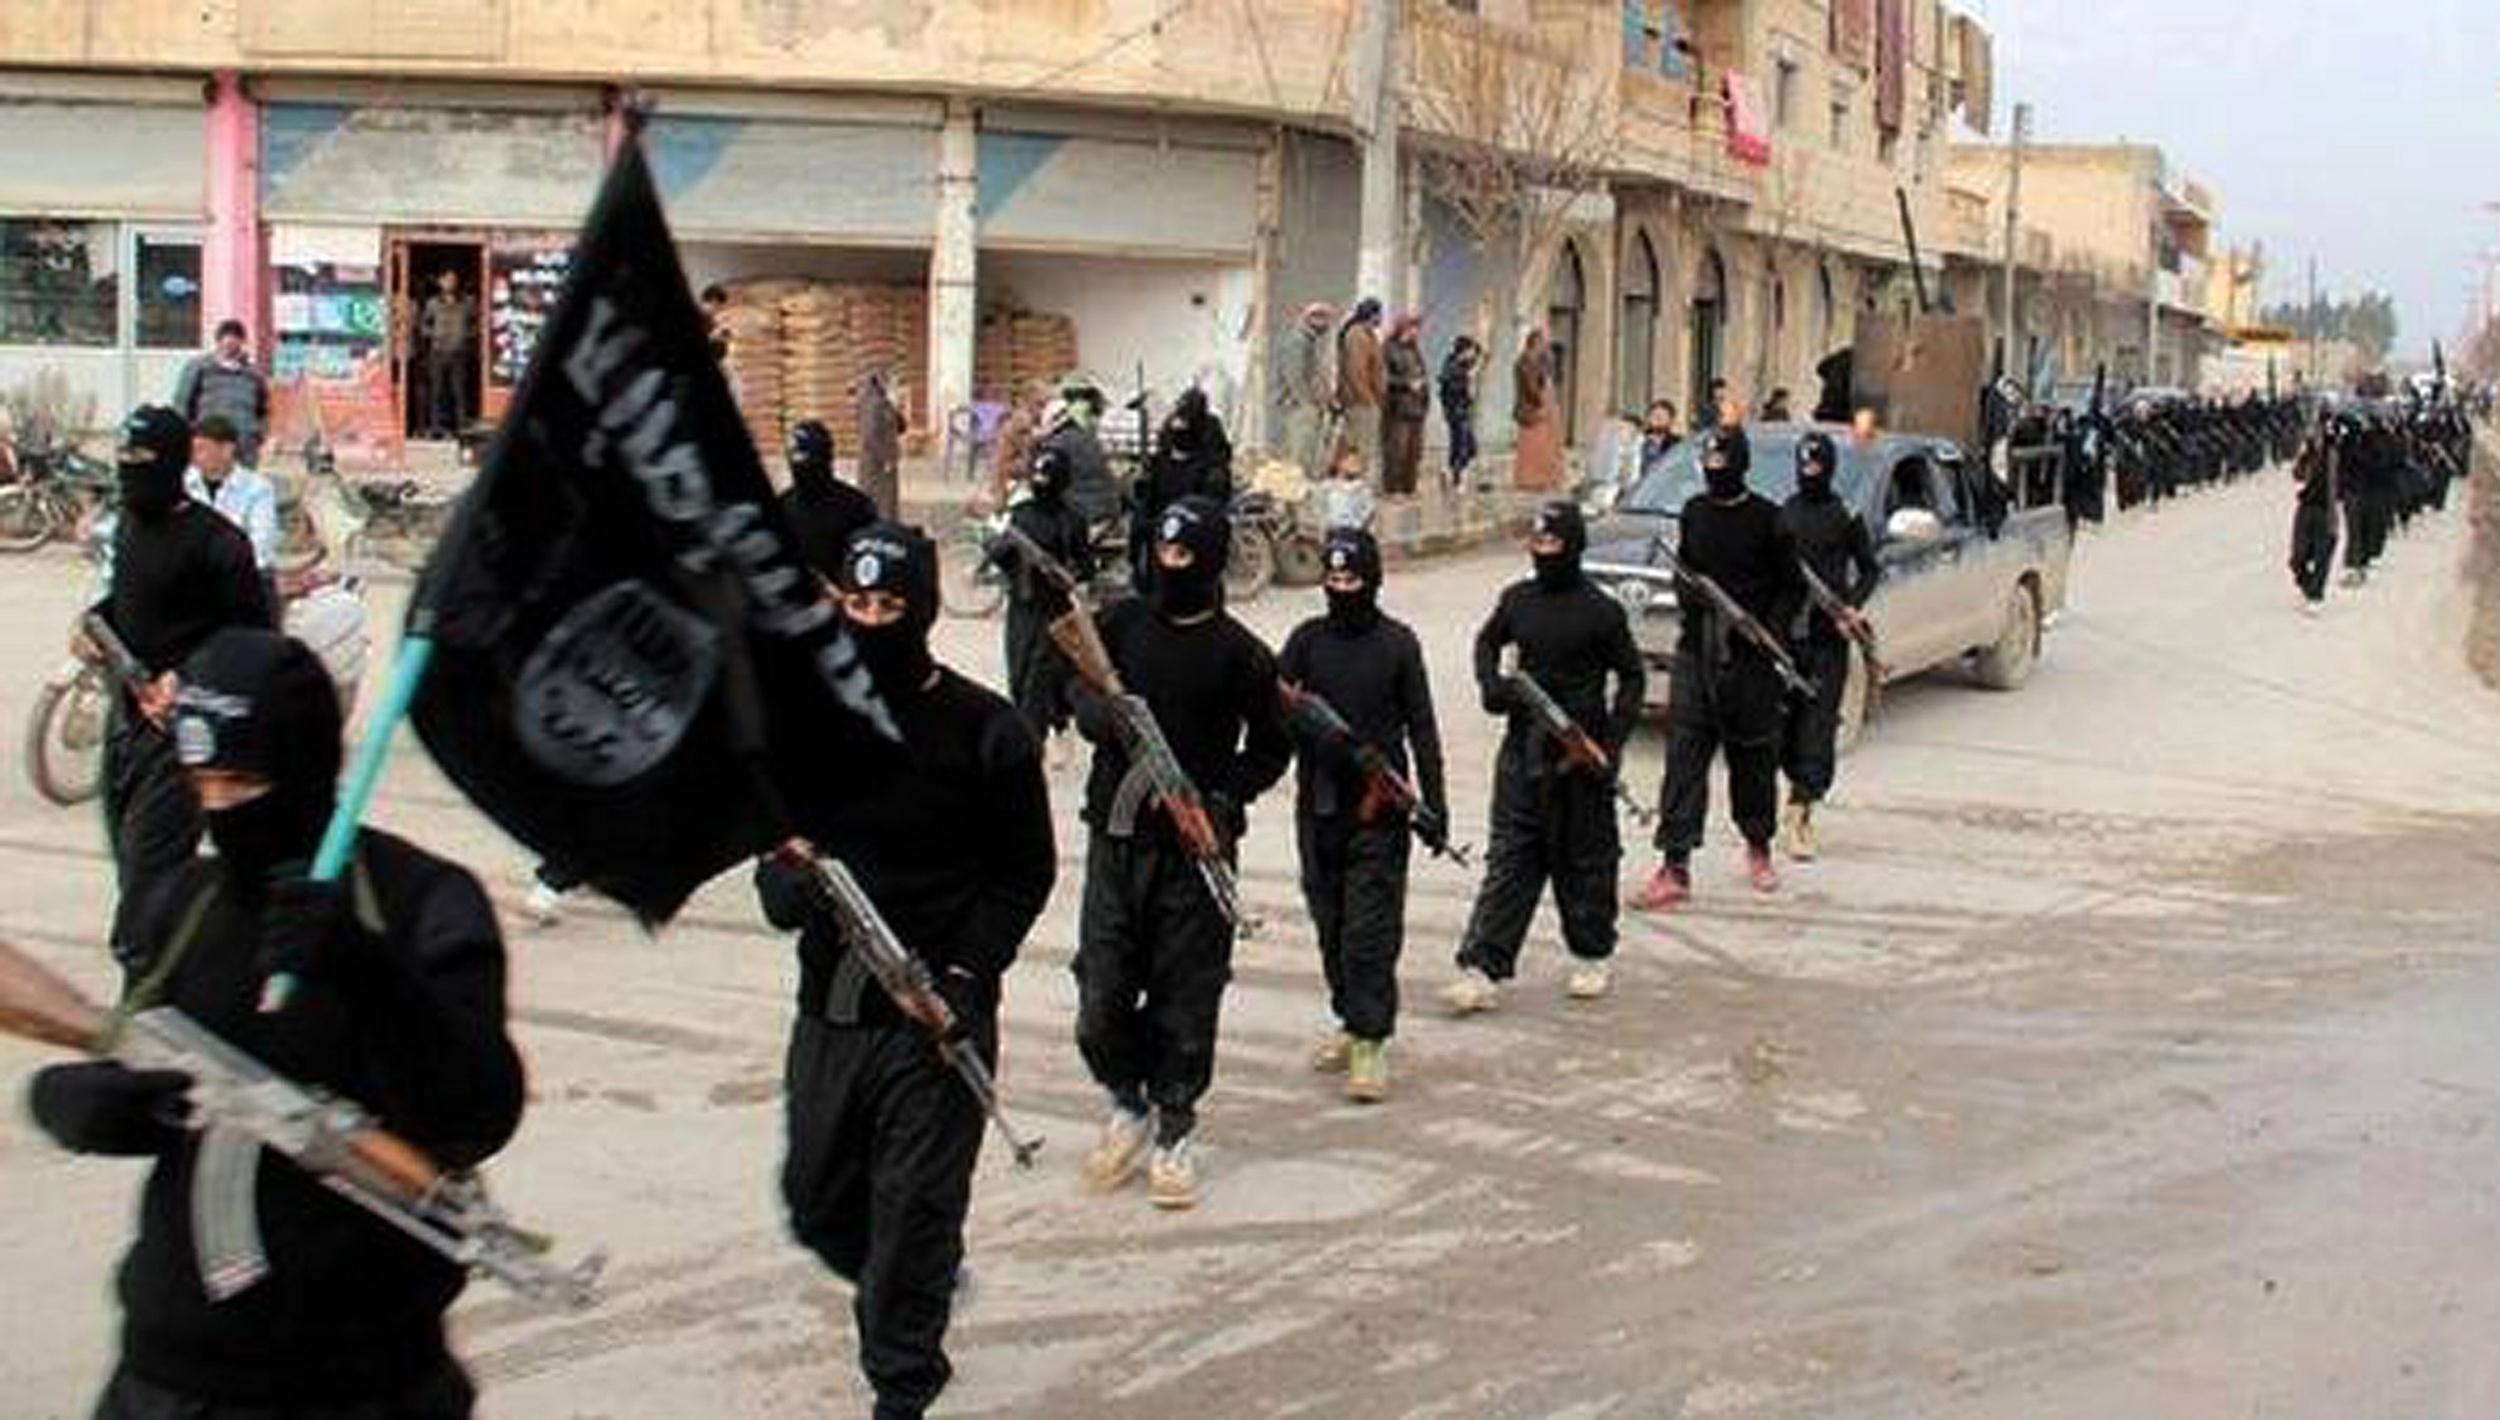 https://www.hate-speech.org/wp-content/uploads/2014/07/140213-syria-isil-austin-11a_f1033efef1001b6d1844d049794846bd.jpg